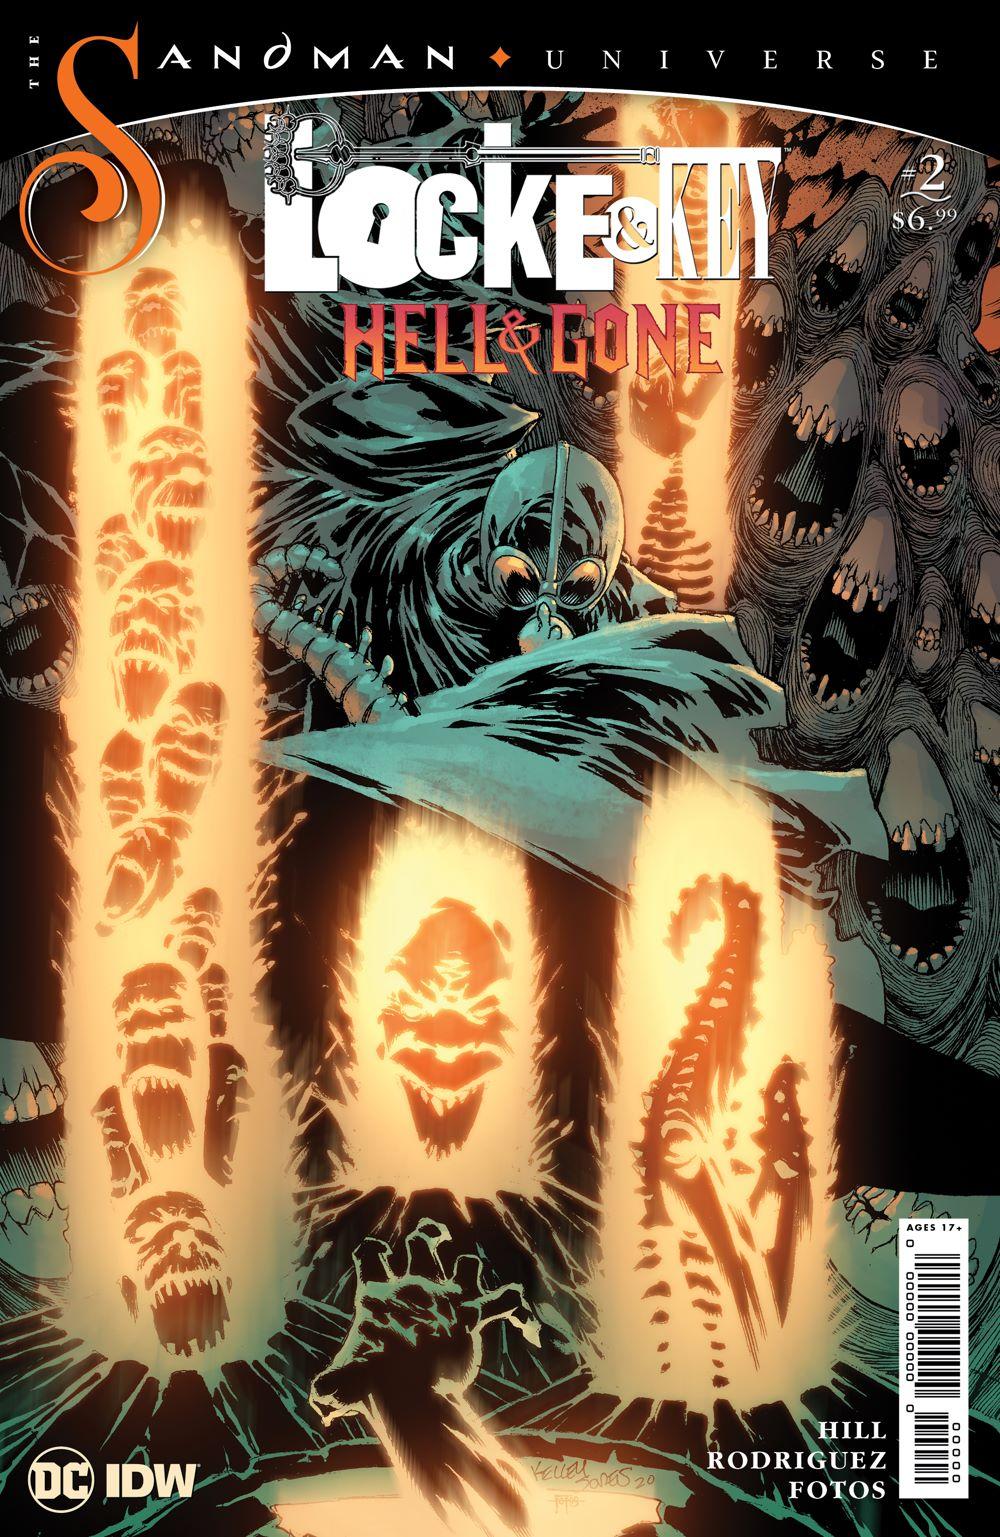 SUNI_LK_HG_Cv2_var_Kelley_Jones DC Comics August 2021 Solicitations